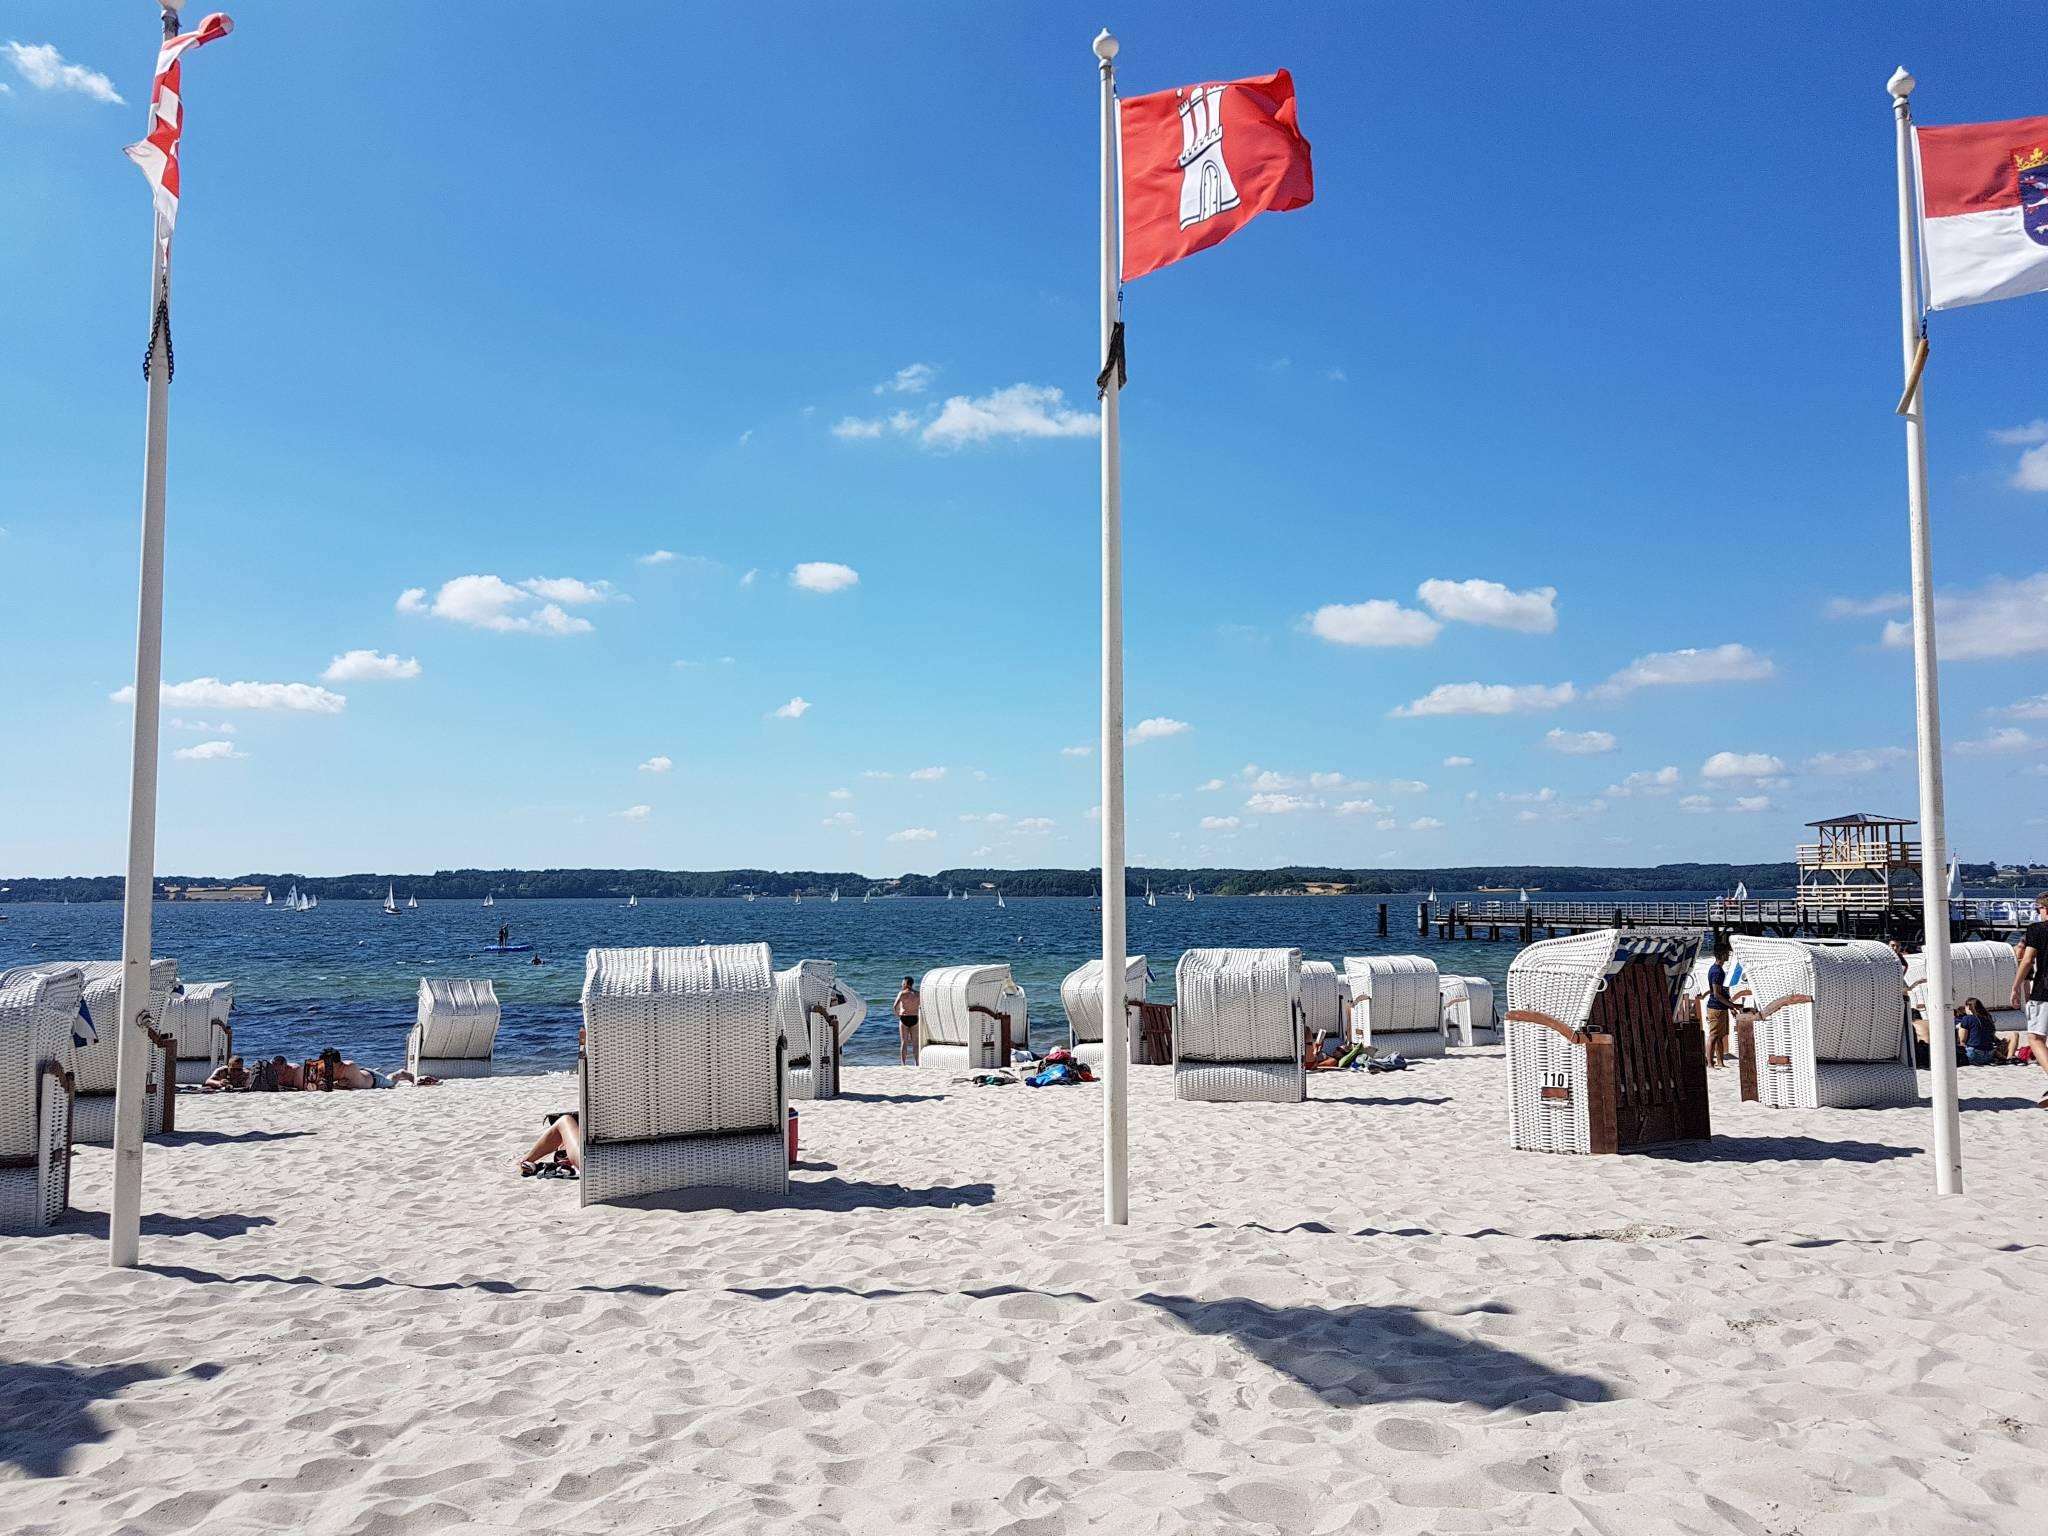 Strand in Glücksburg-Sandwig